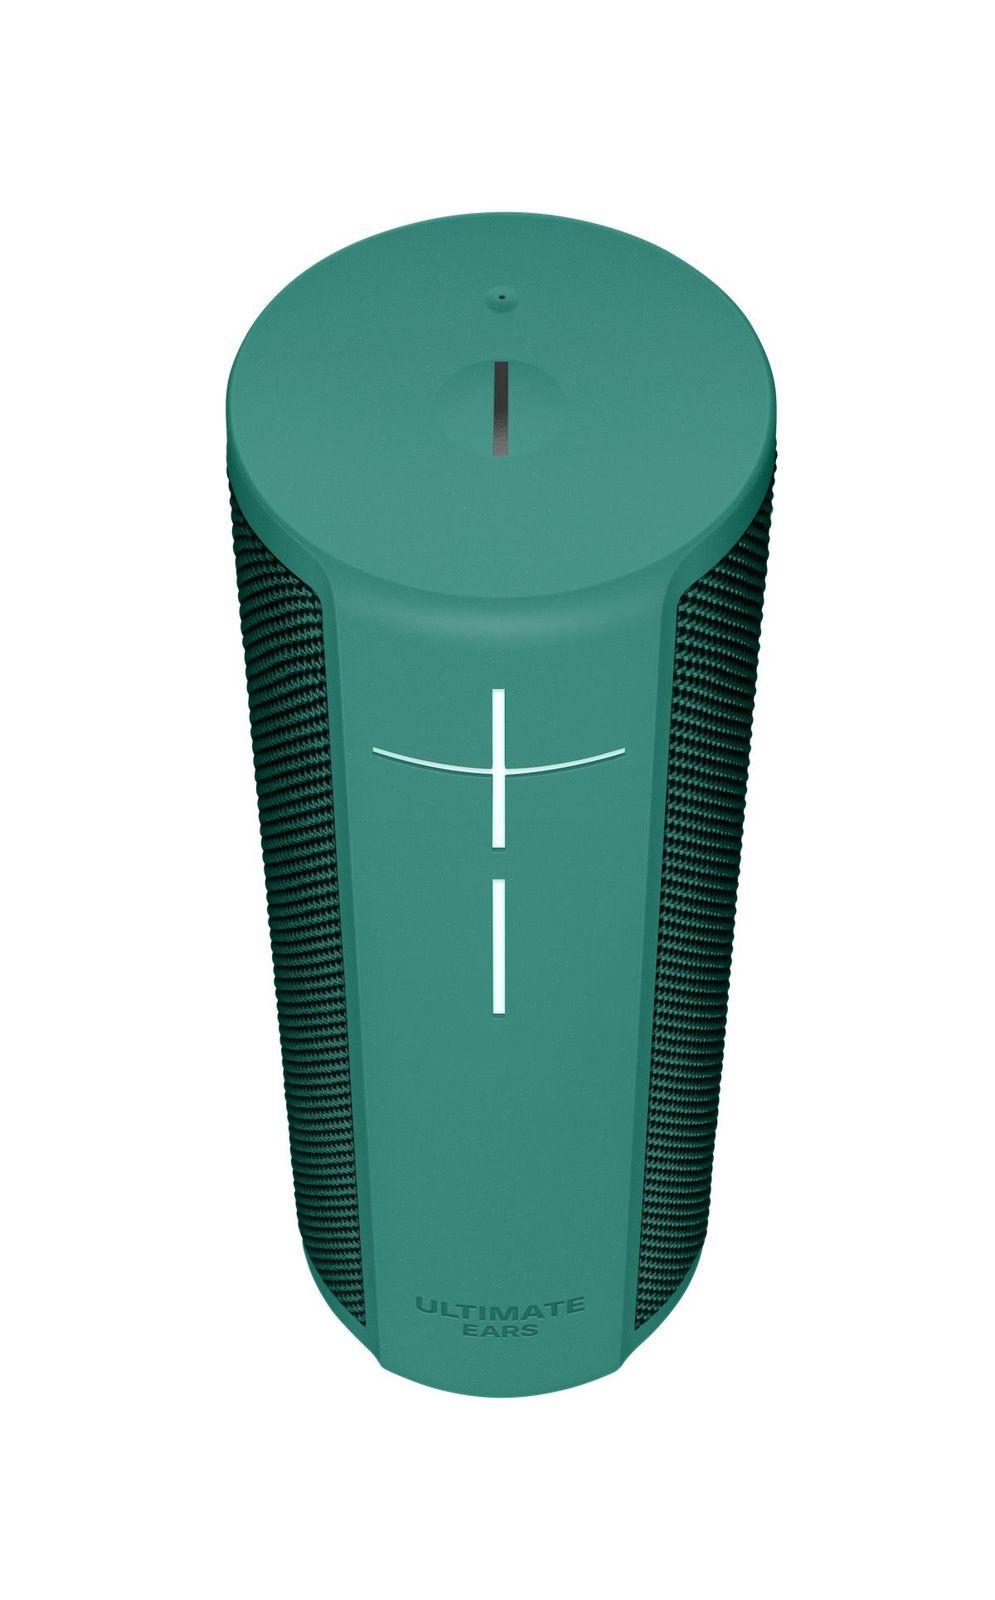 Logitech Ultimate Ears MegaBlast - Mojito Green image